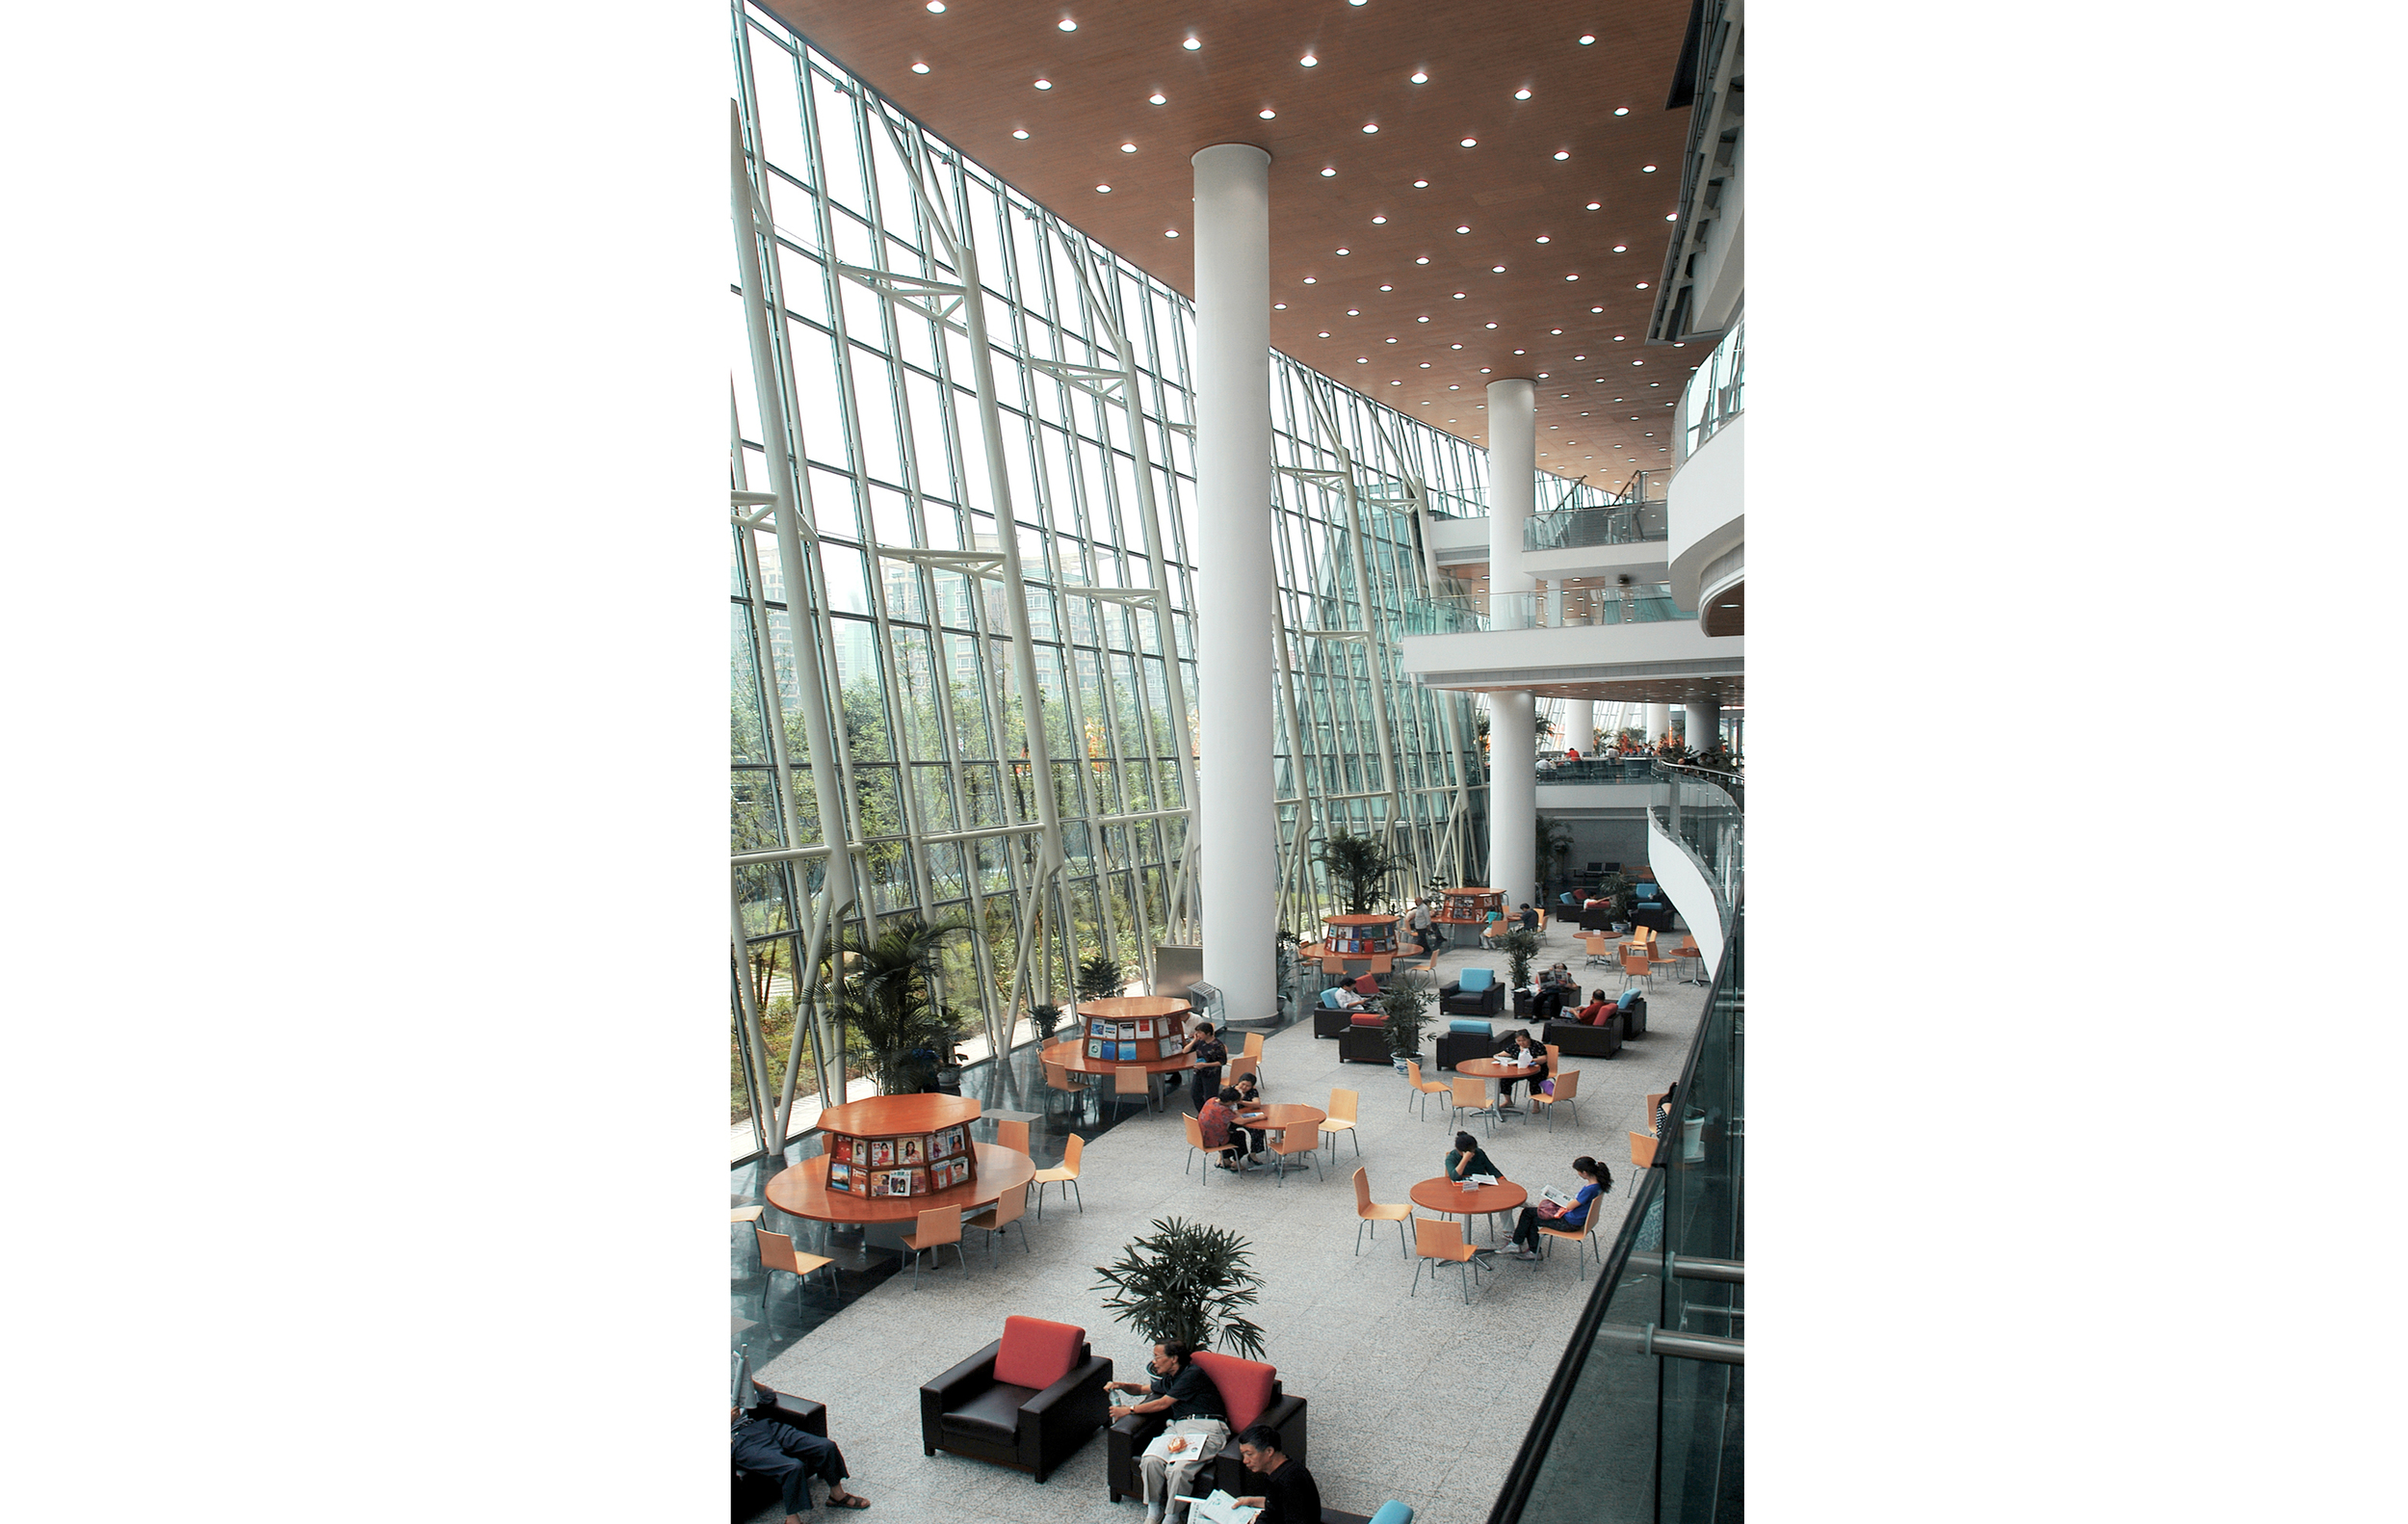 Chongqing Library Interior - Plan A